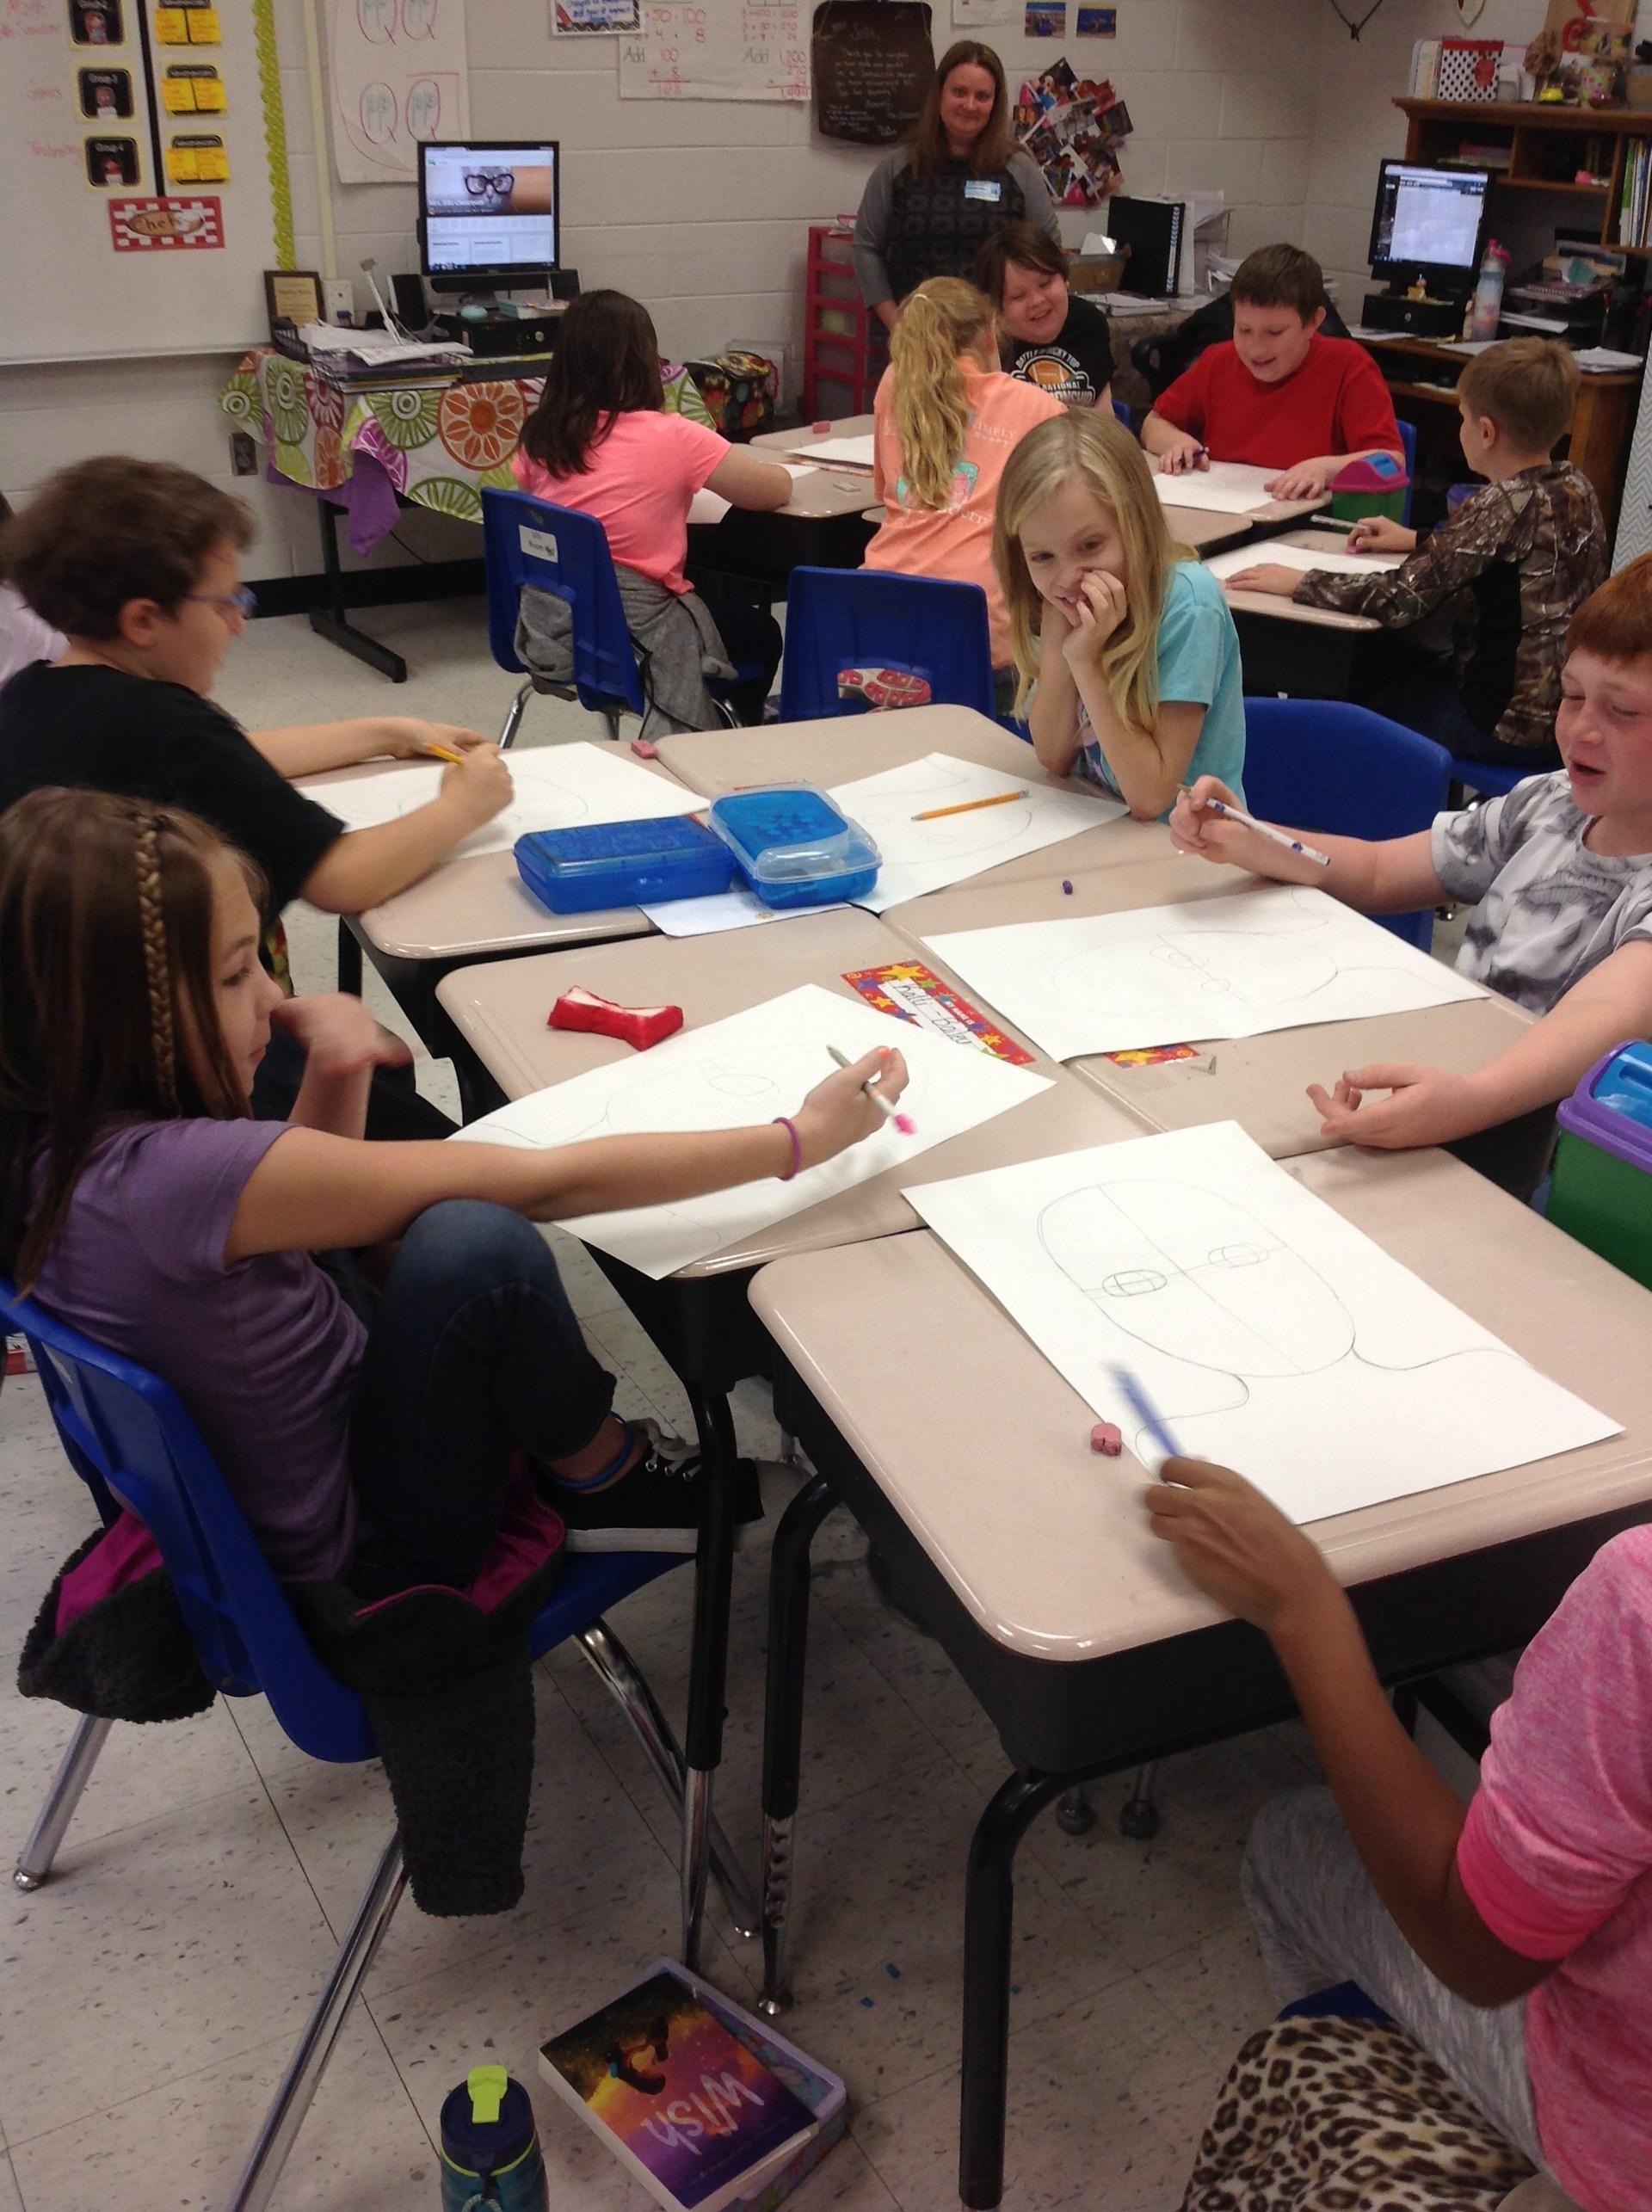 Kalli's group working on their portraits.